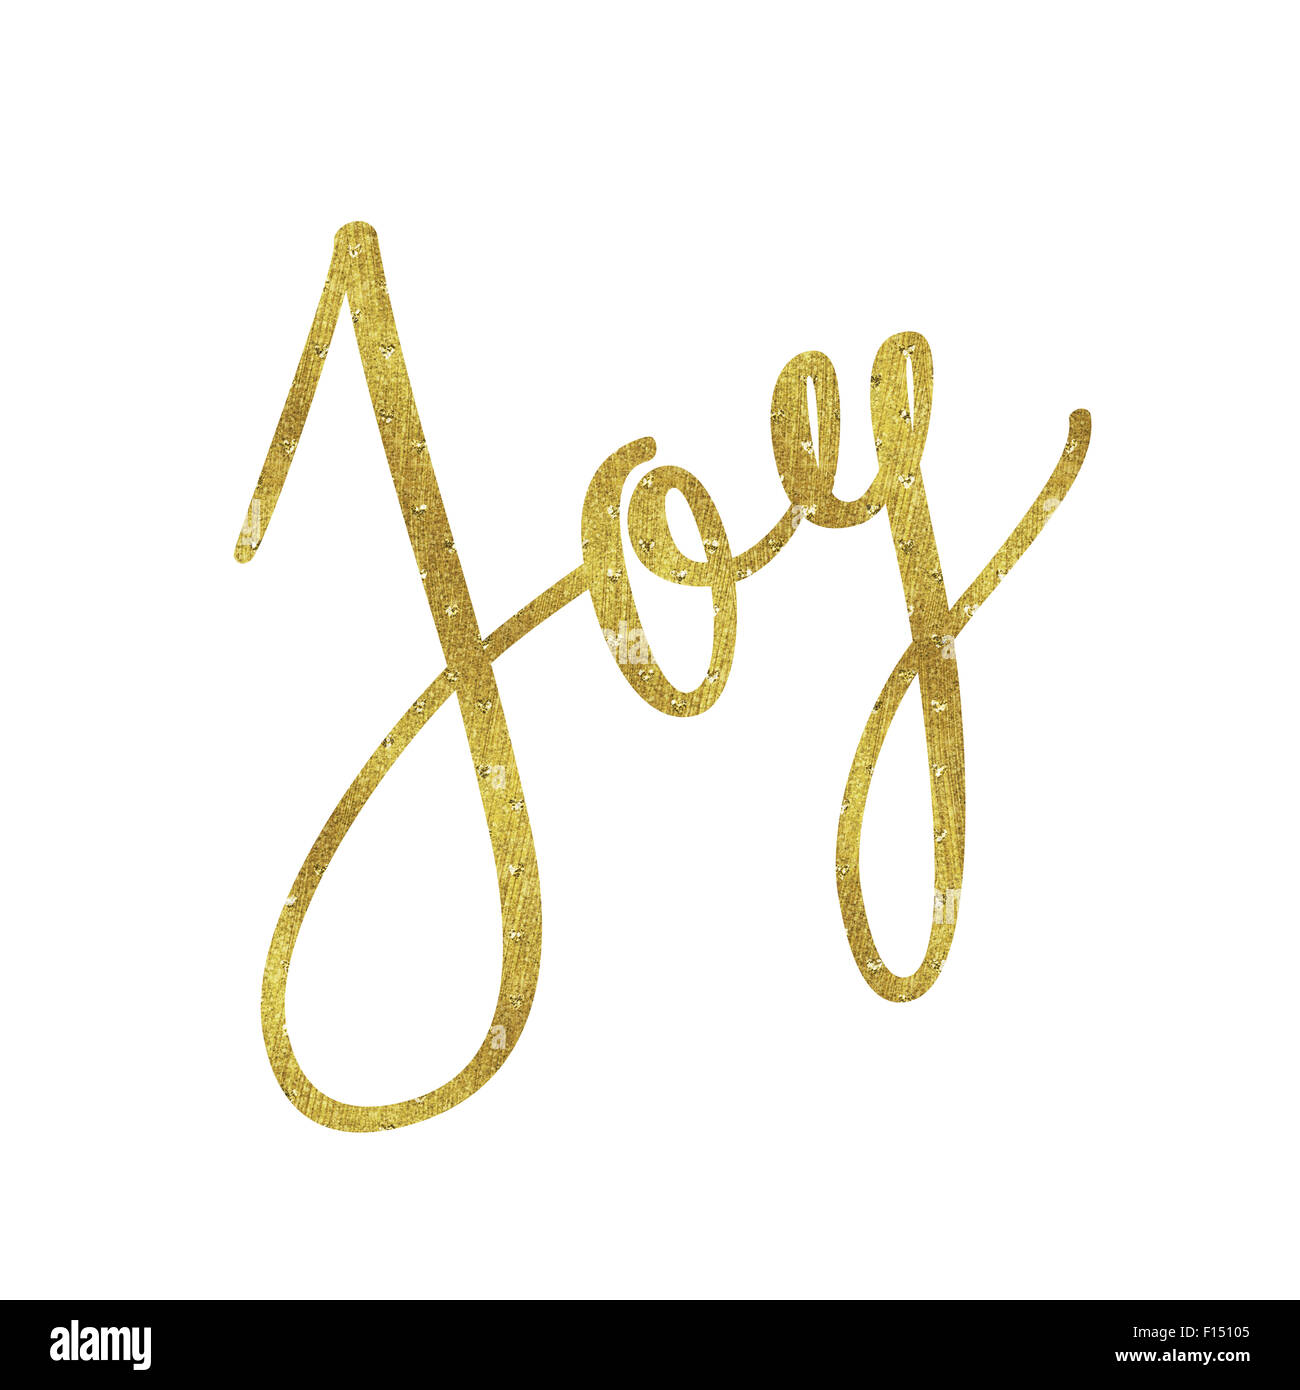 Freude Gold Faux Folie Metallic Glitter inspirierende Weihnachten ...